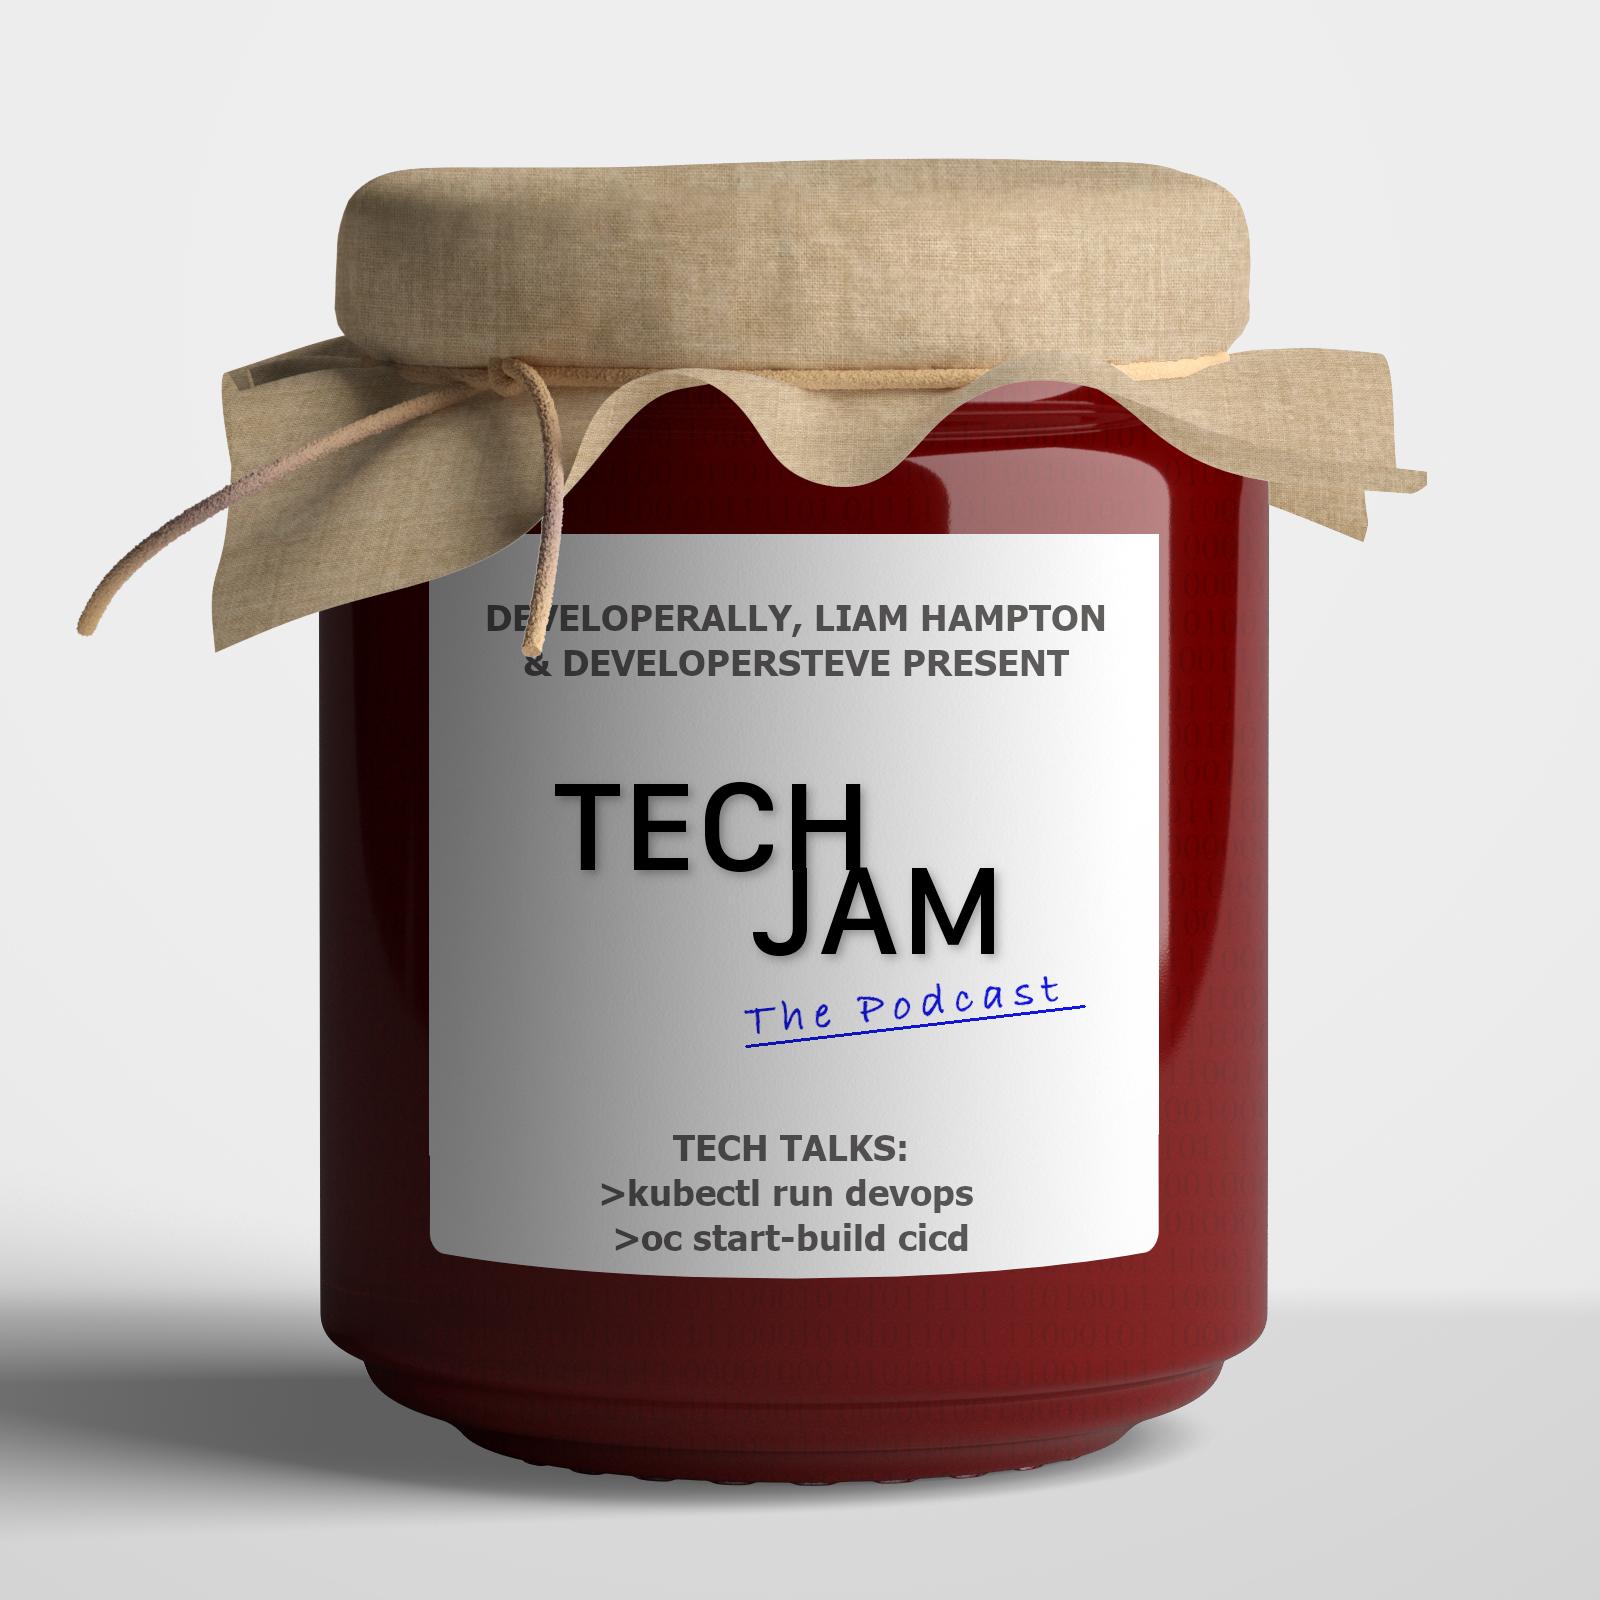 Tech Jam podcast episode 8 series 1 image